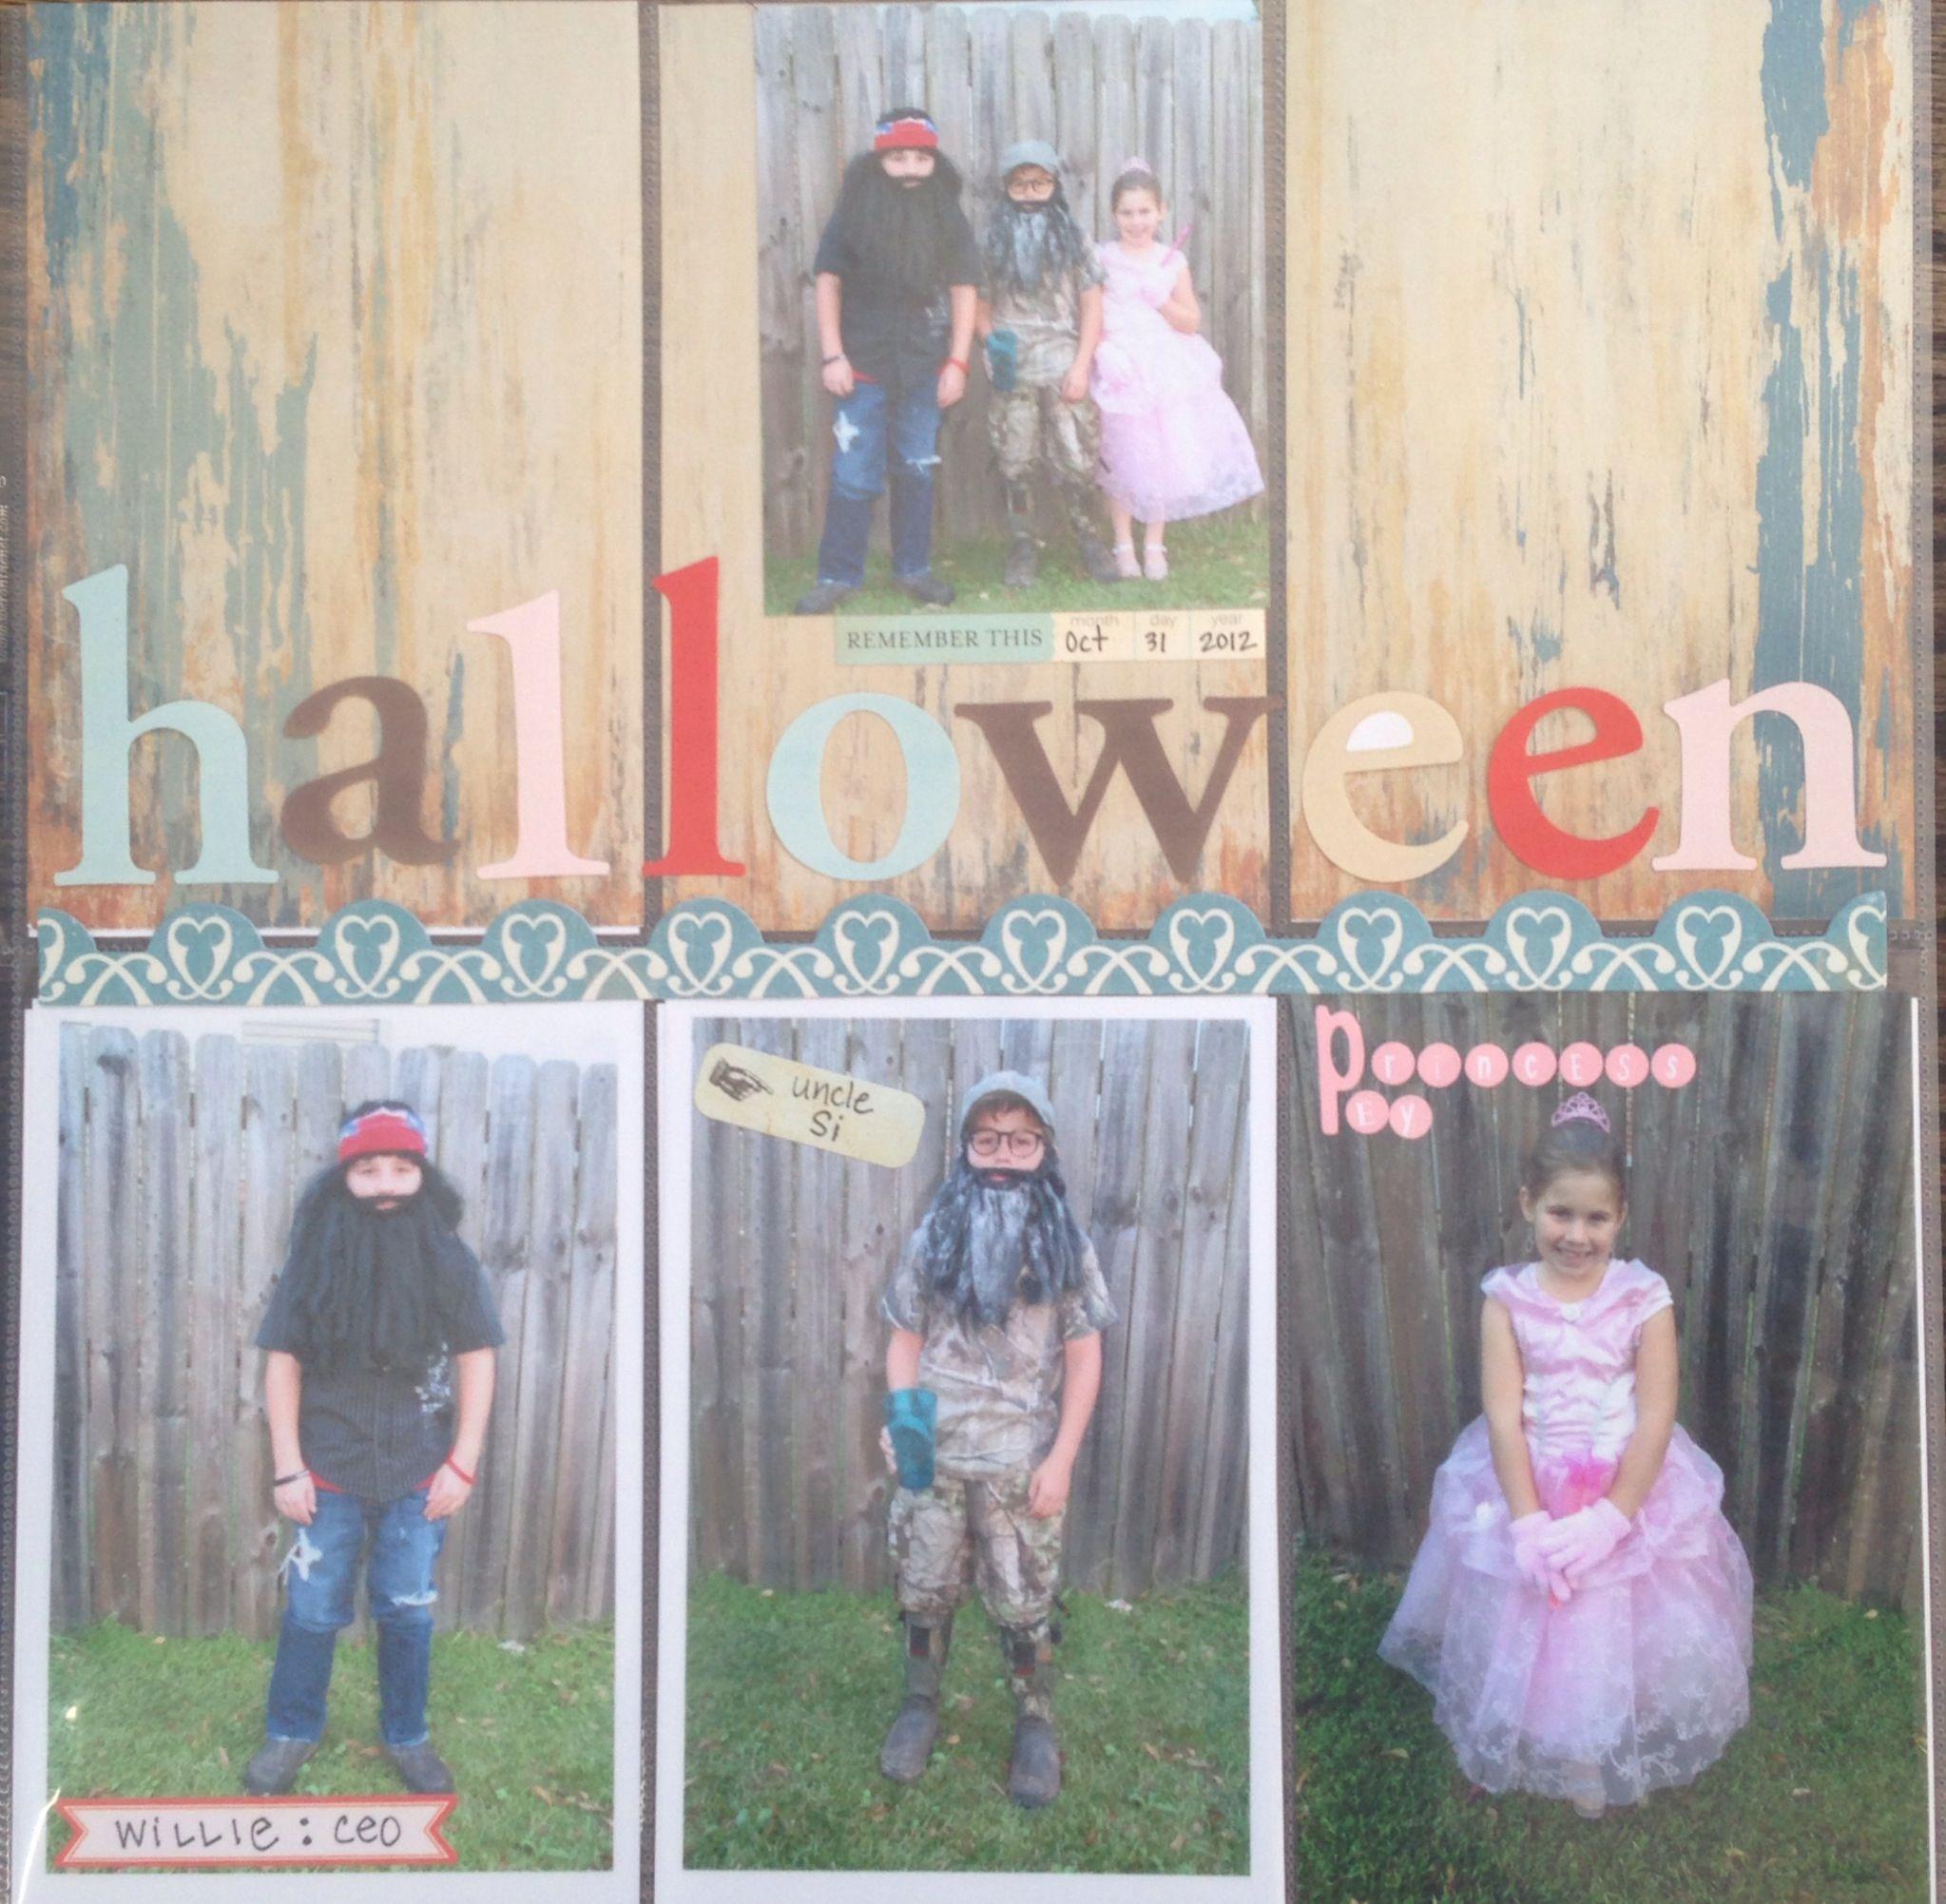 Halloween duck dynasty scrapbook layout | a deb design | Pinterest